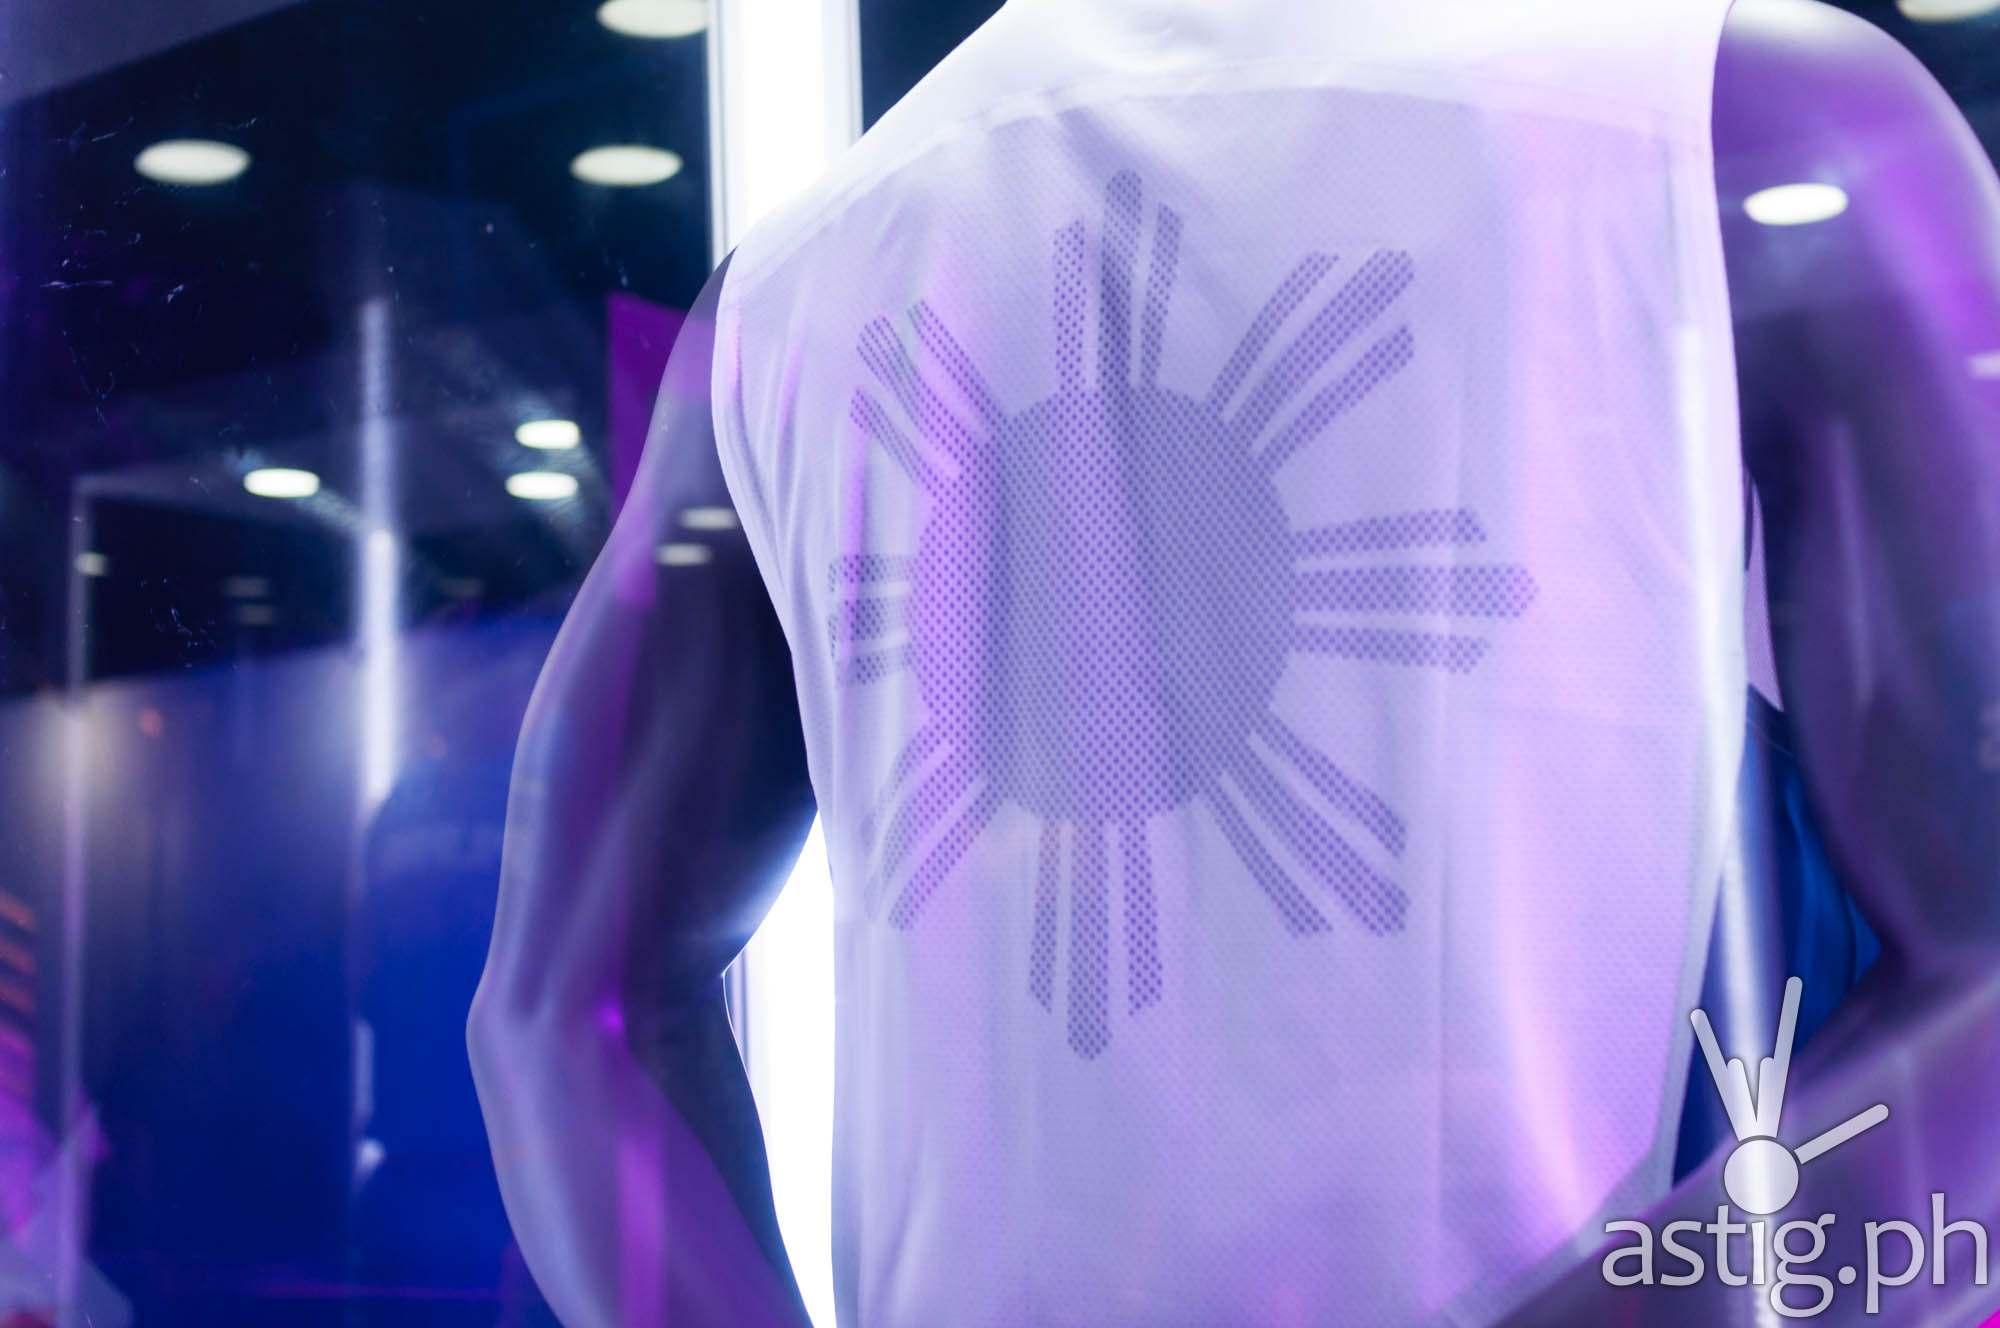 Gilas Pilipinas 2014 FIBA uniform by Nike (white back)